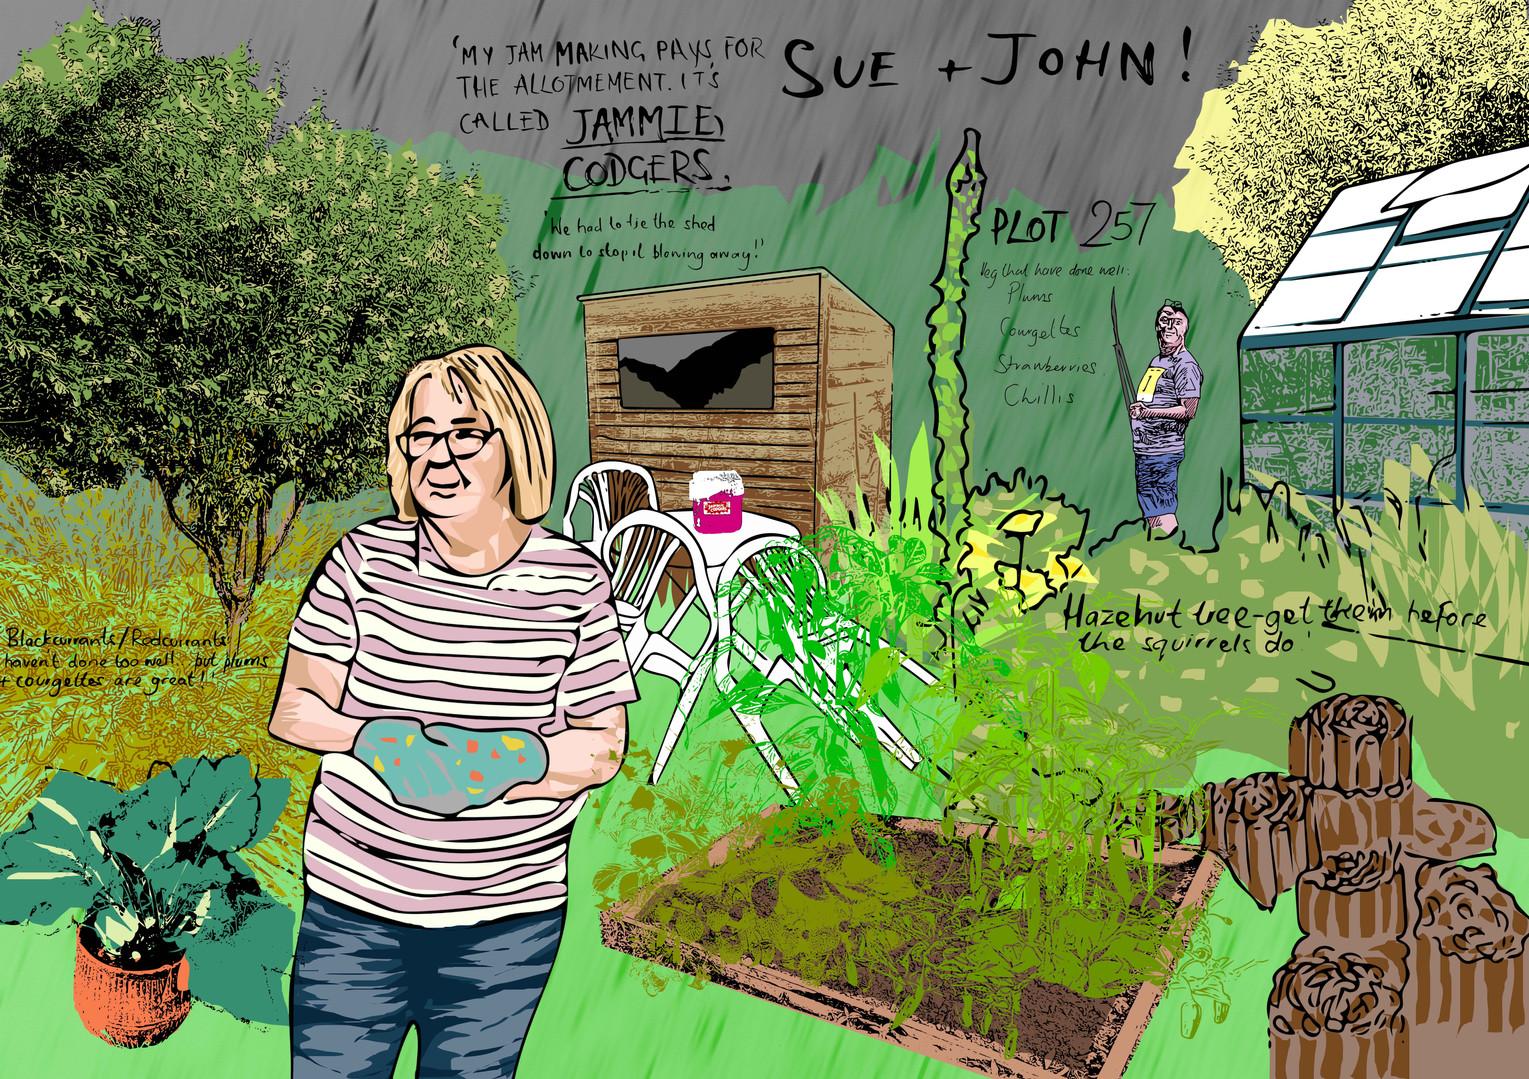 Sue and John